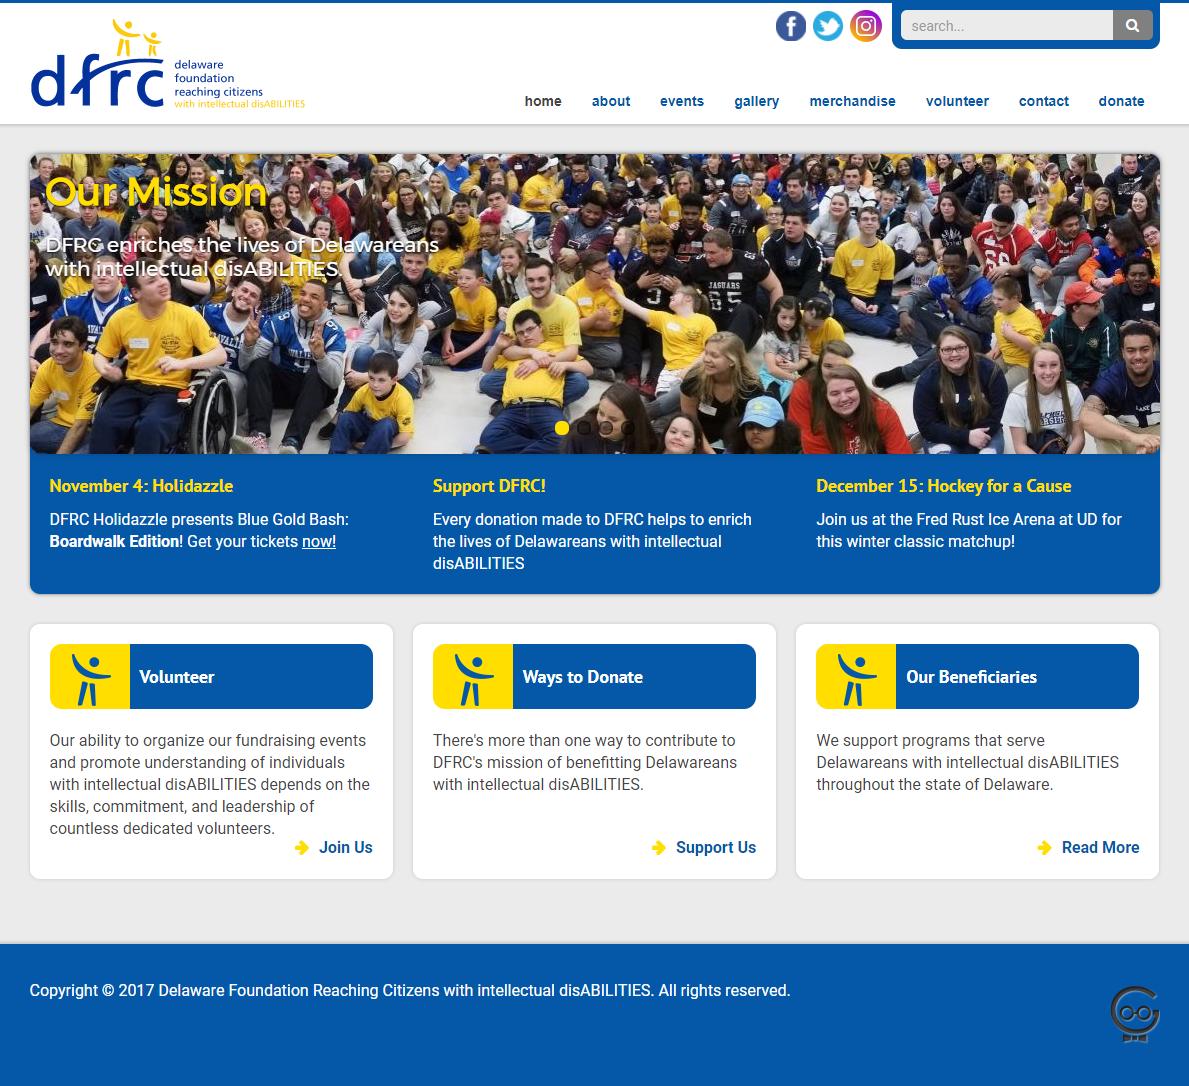 DFRC website